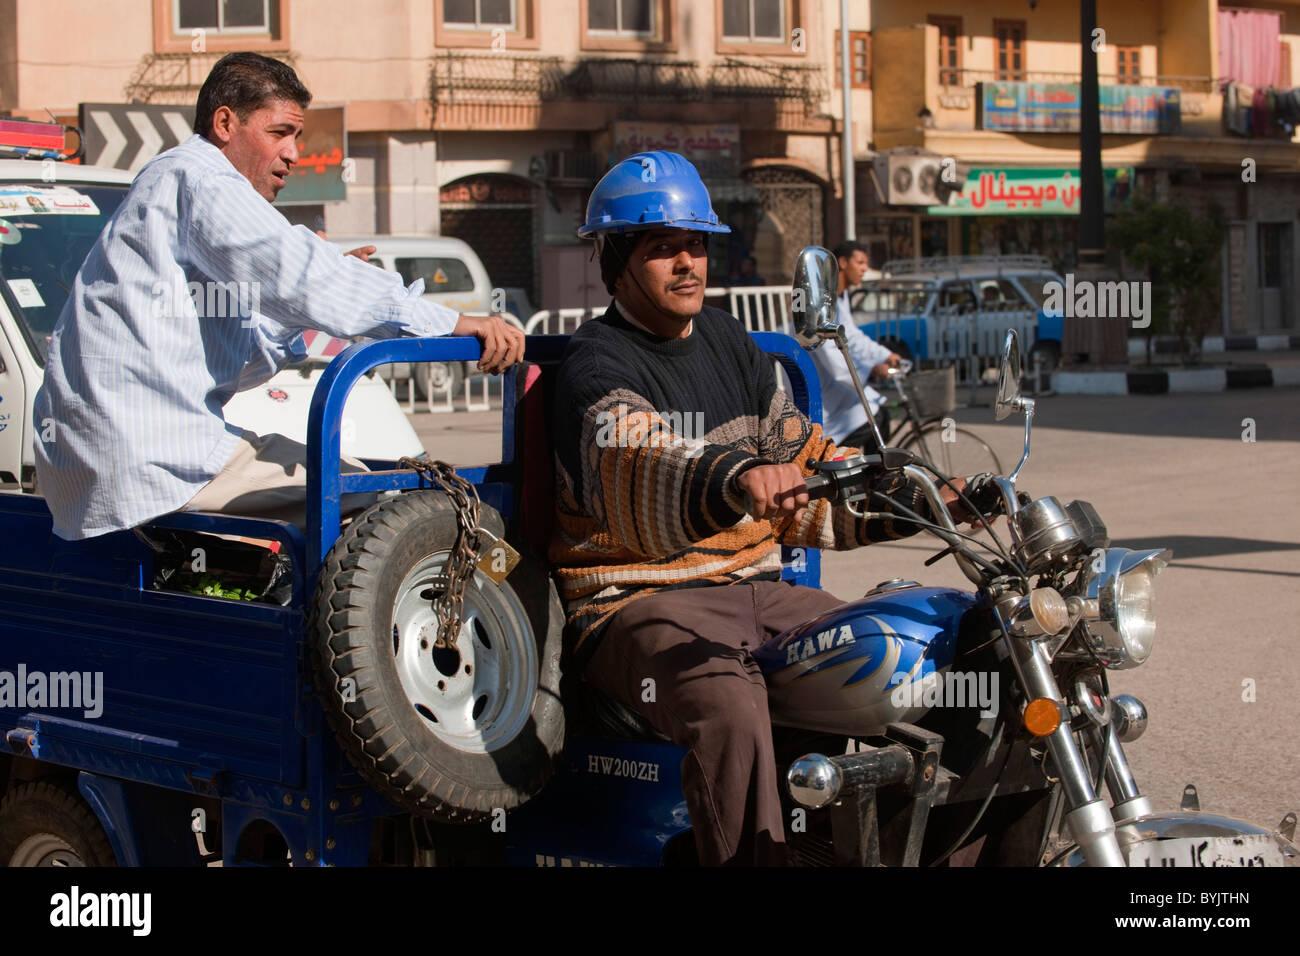 Aegypten, Luxor, Strassenszene Stock Photo: 34220529 - Alamy